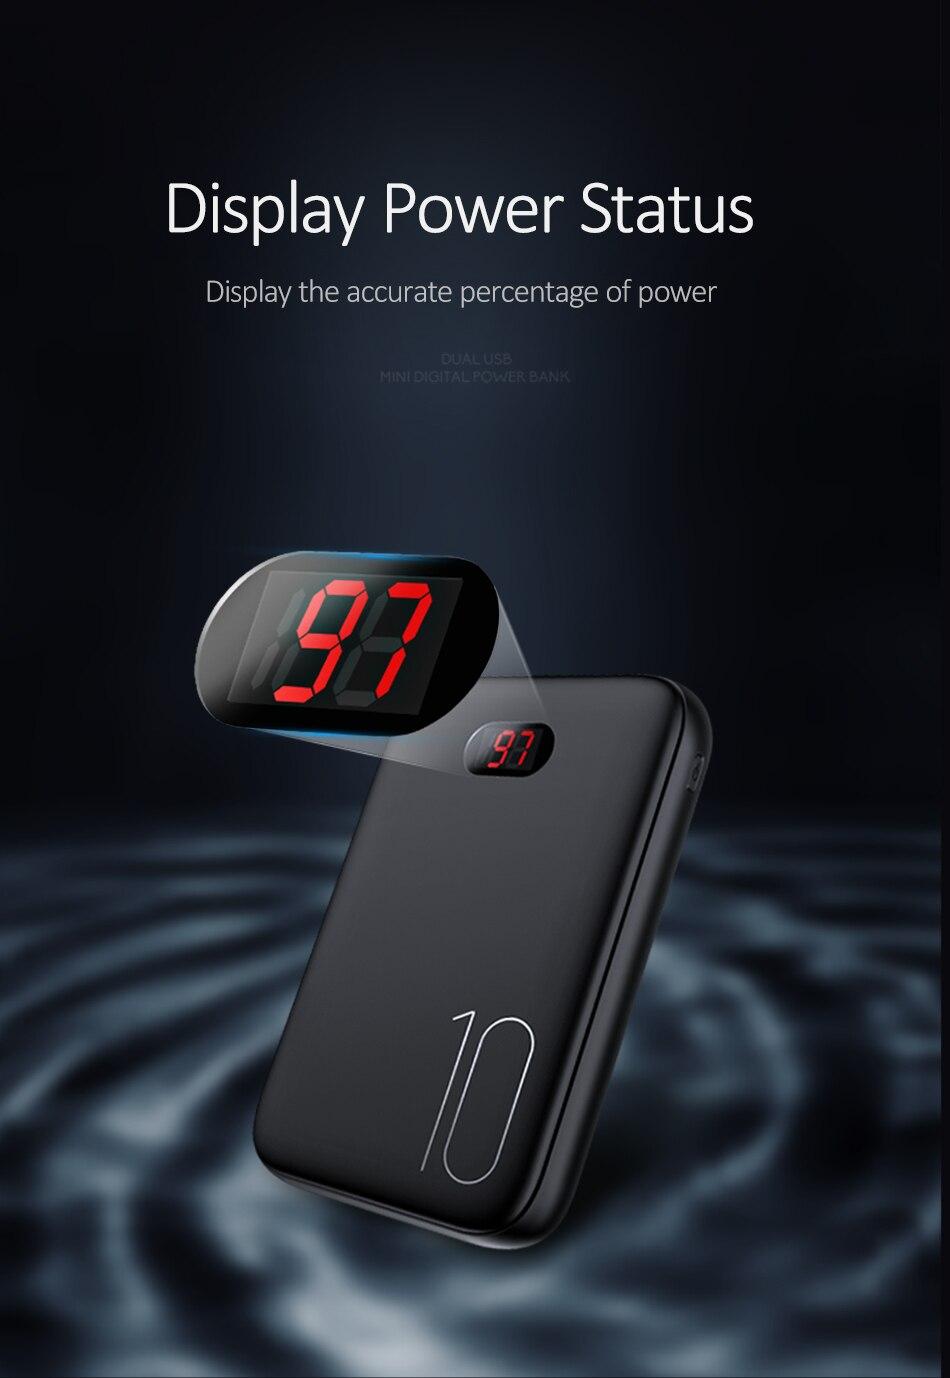 dual usb mini power bank with led display powerbank (5)